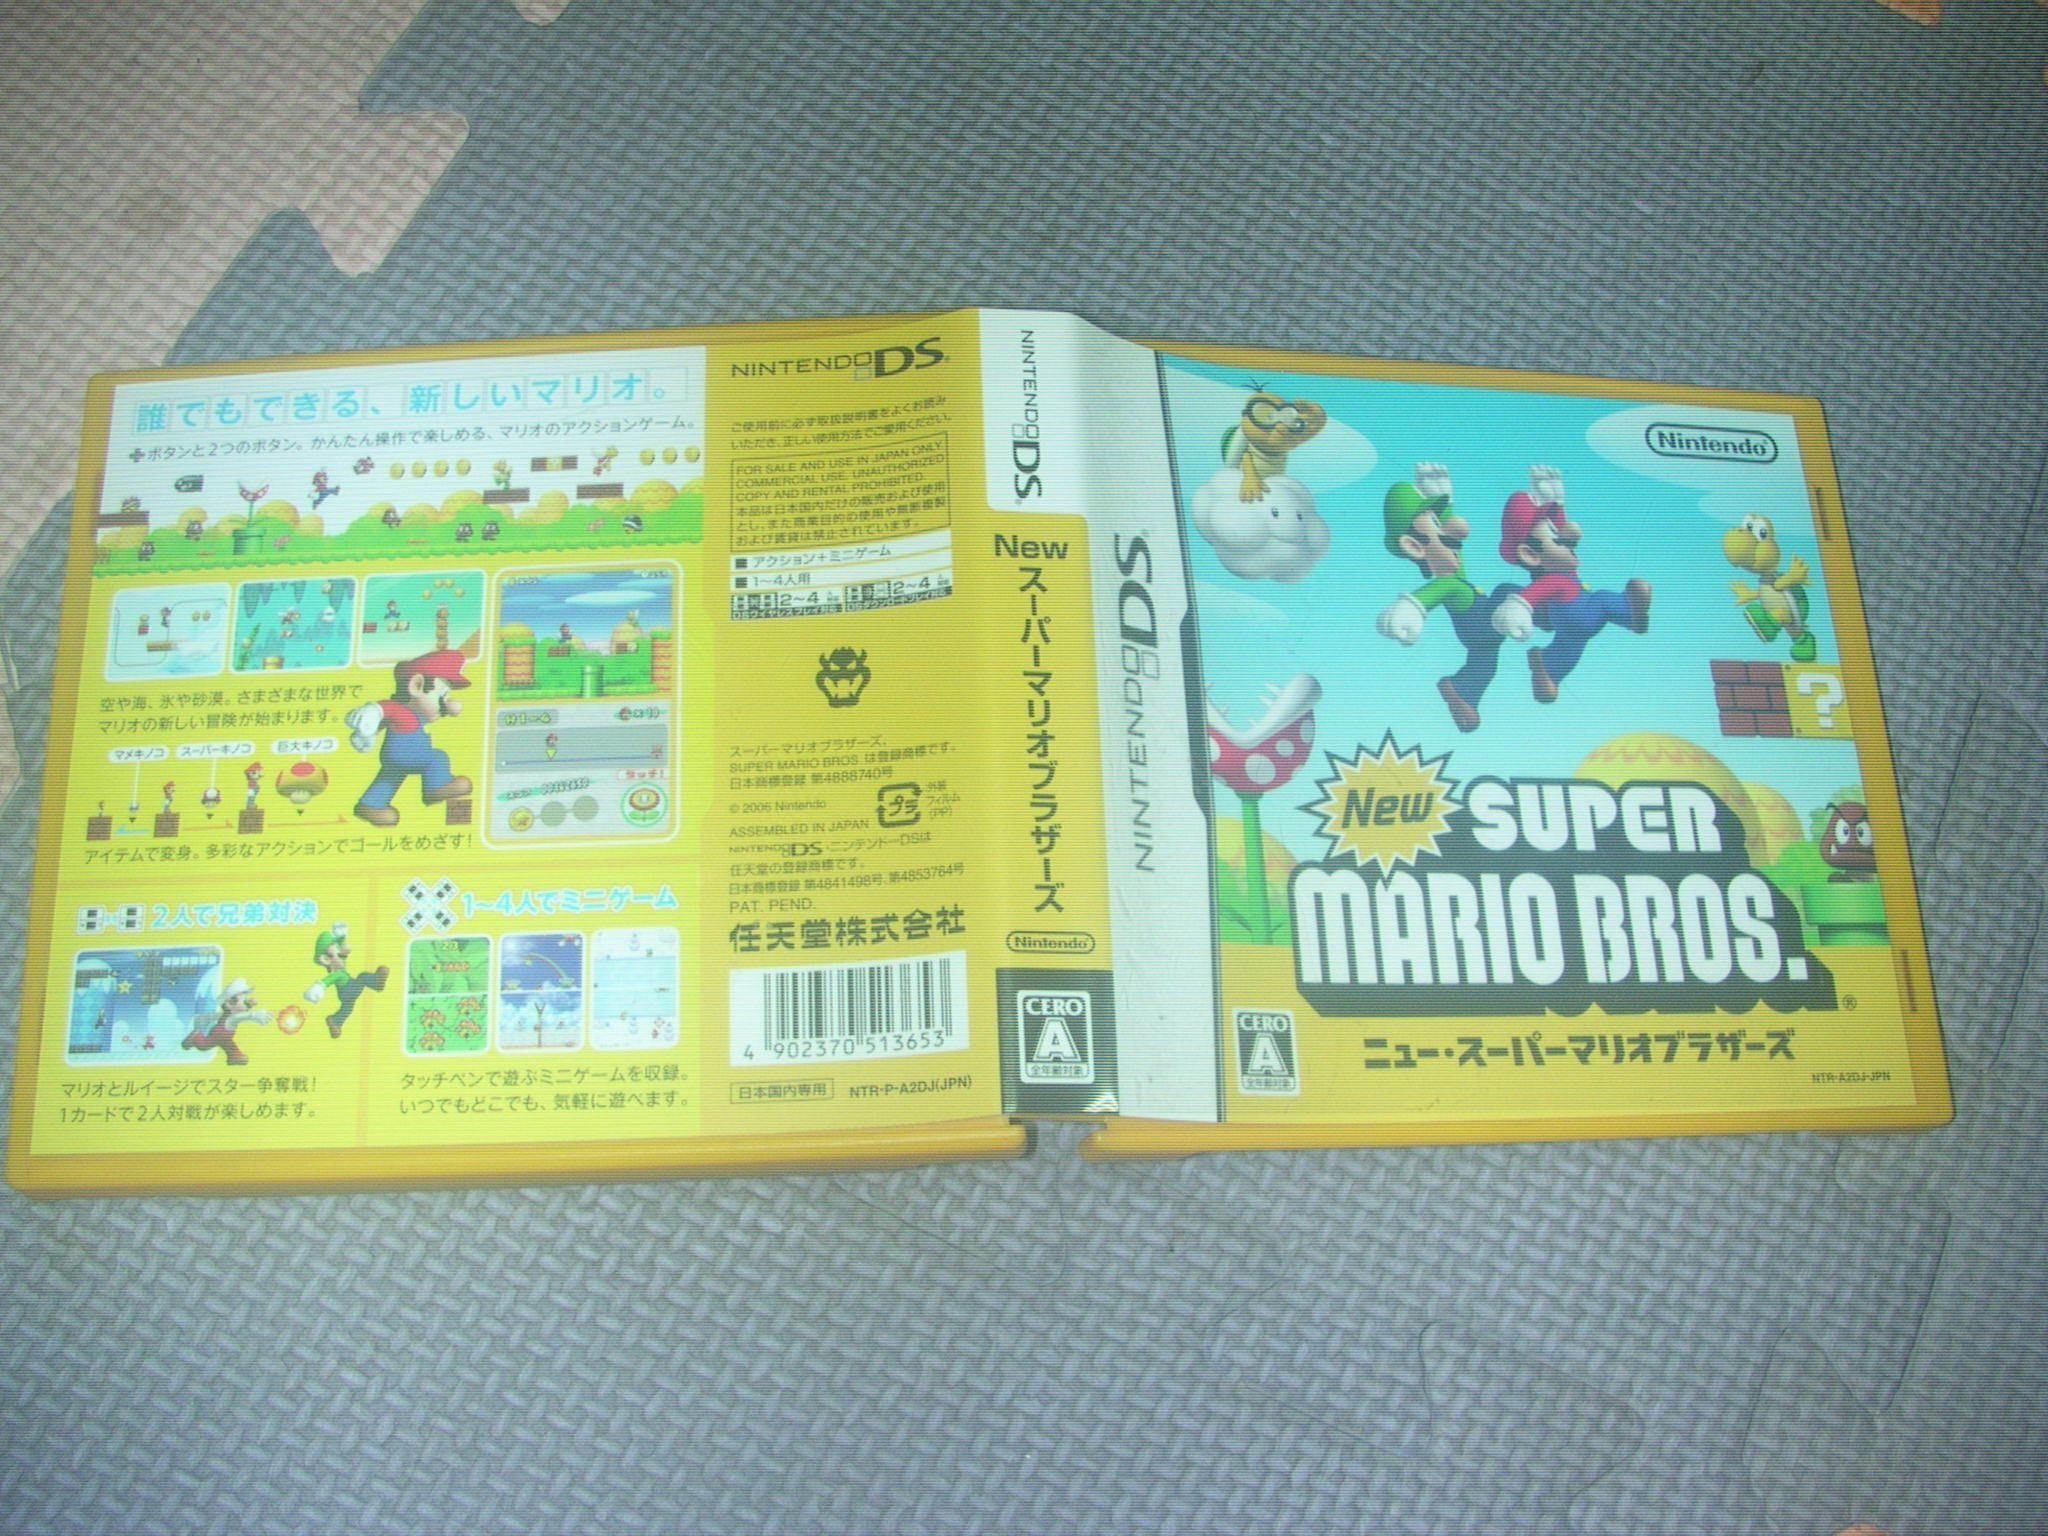 NDS卡帶 NEW新超級瑪利歐兄弟盒裝